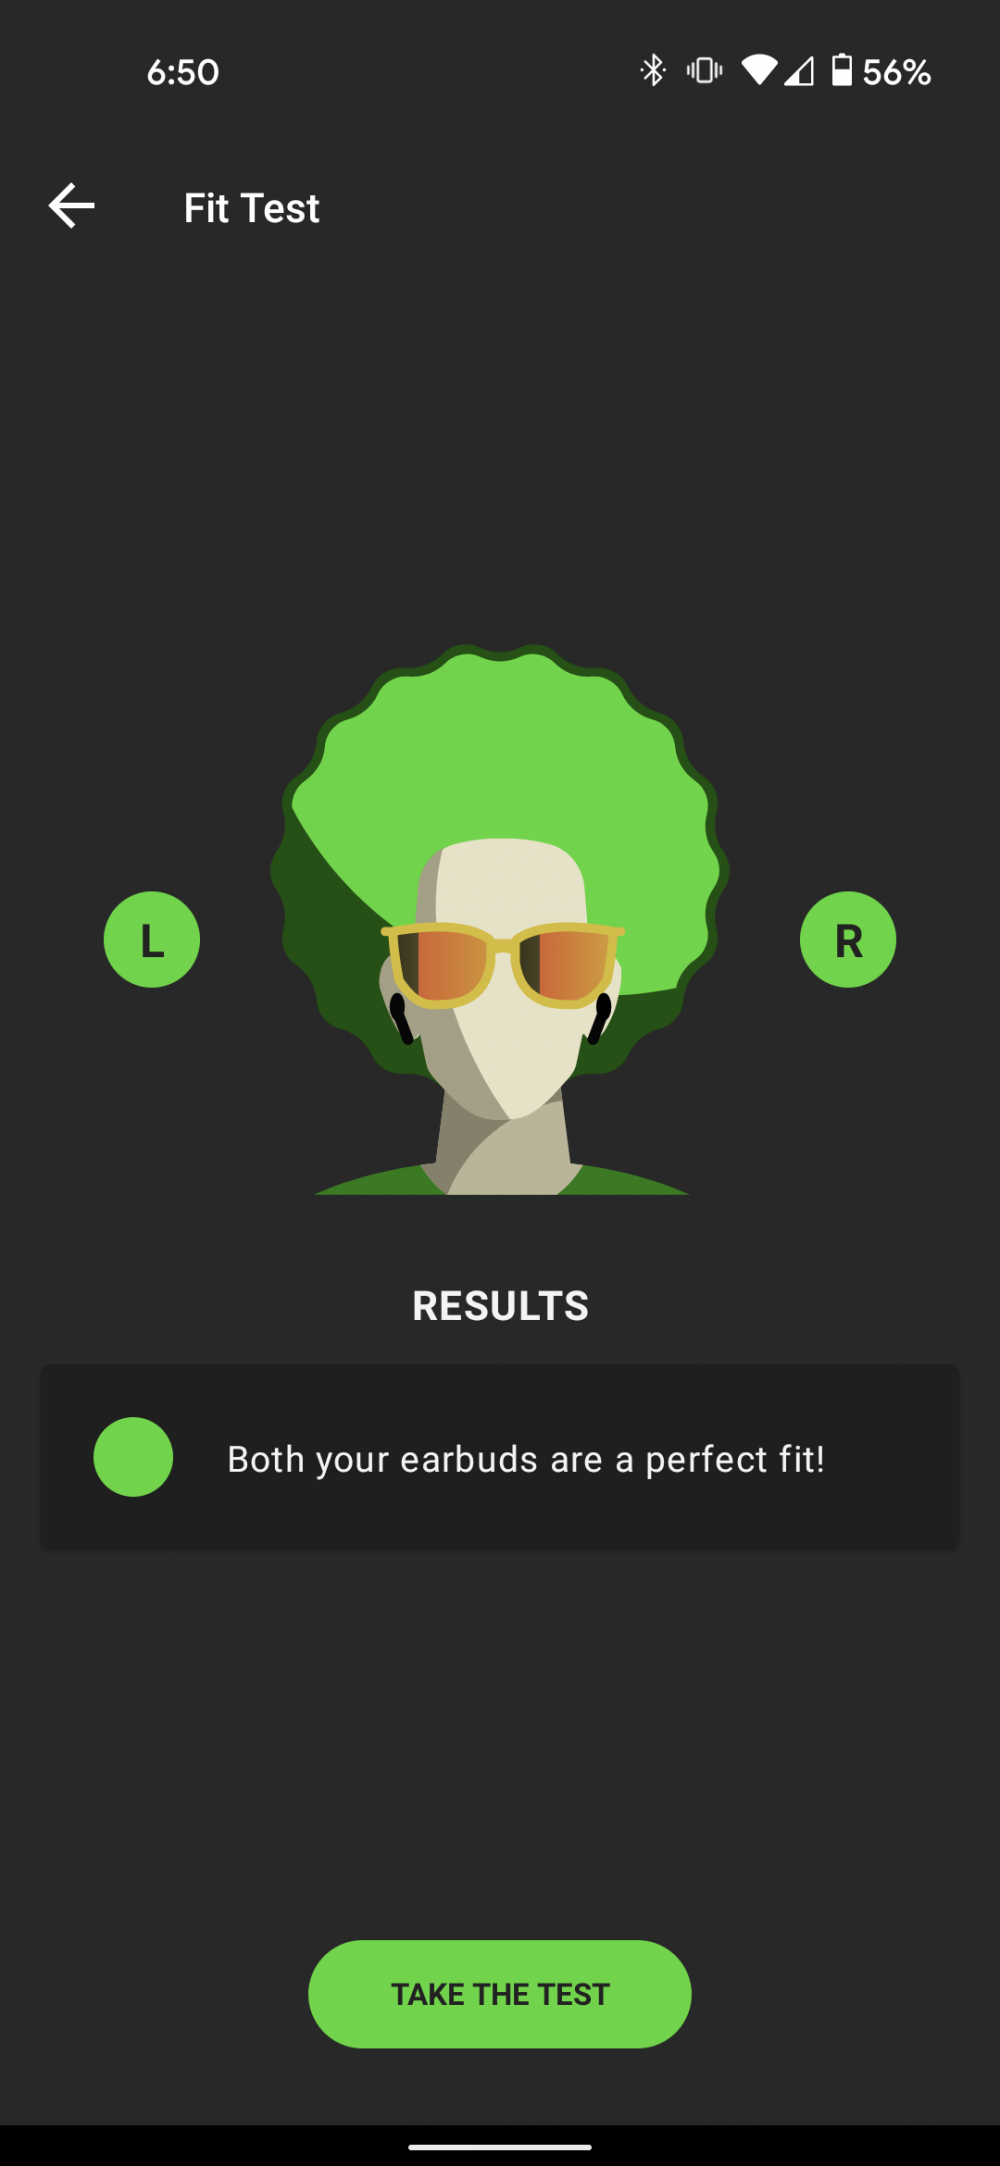 A screenshot post-fit test